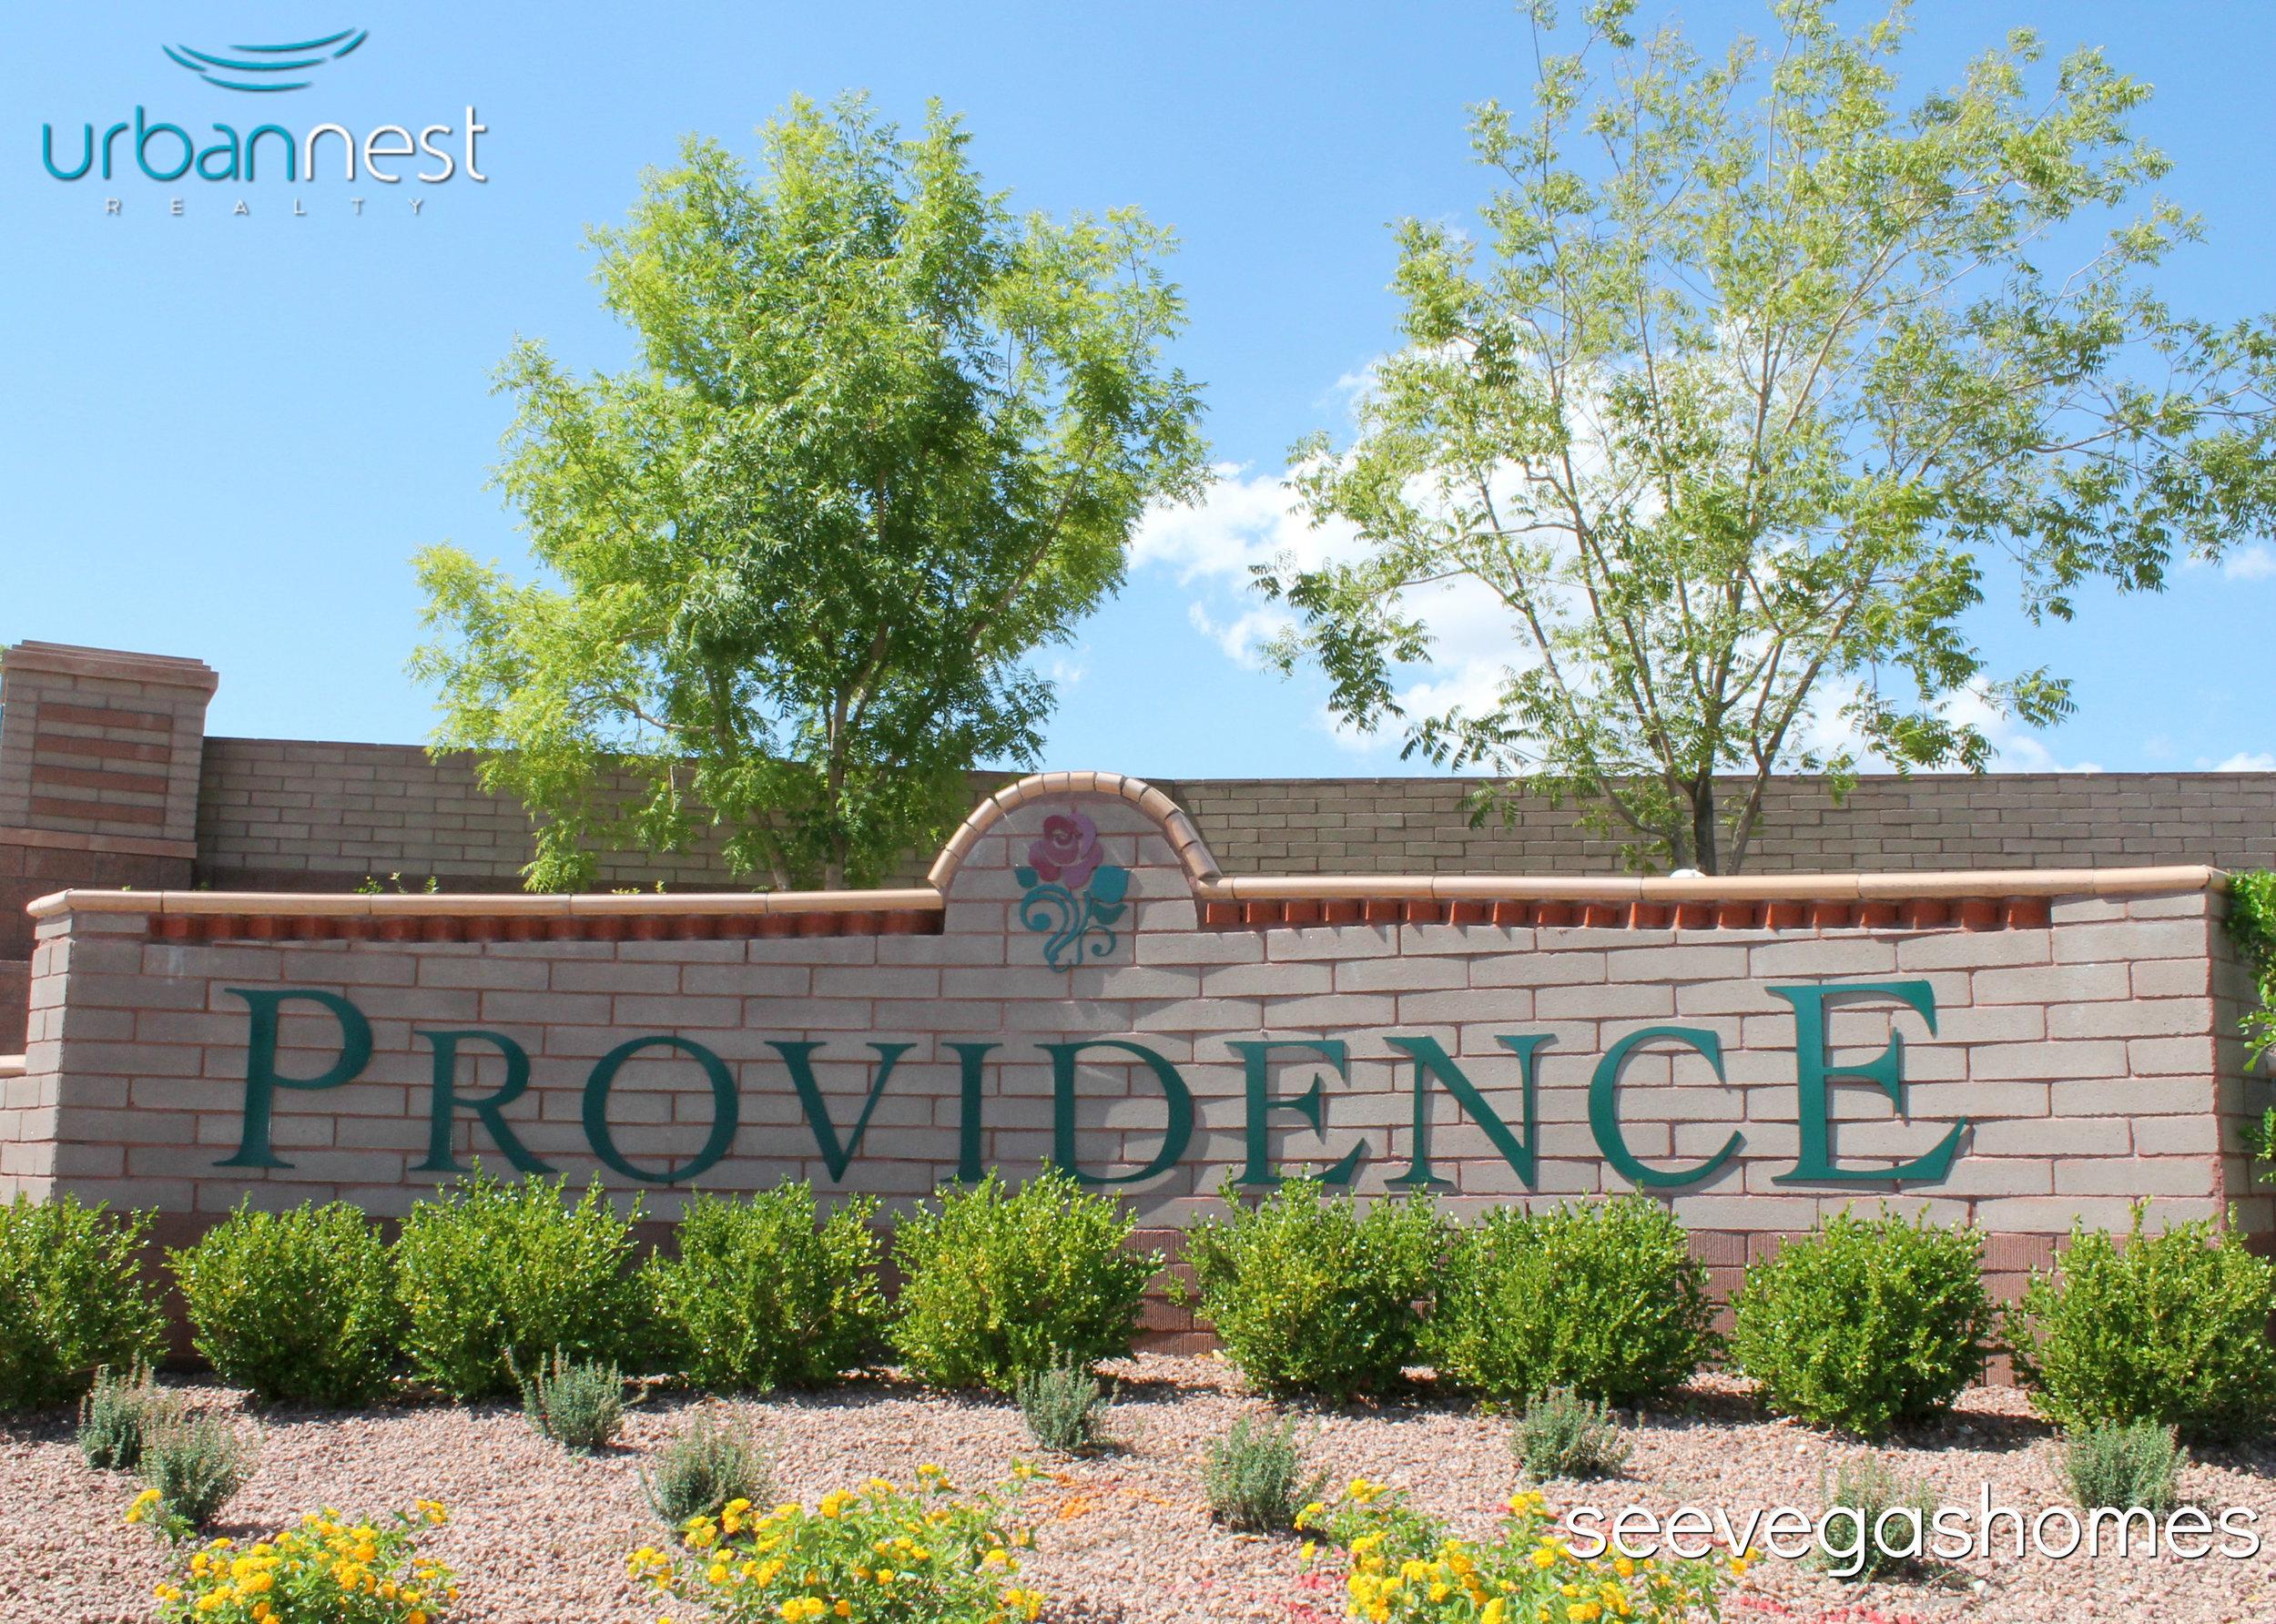 Providence_Las_Vegas_NV_89166_SeeVegasHomes.jpg